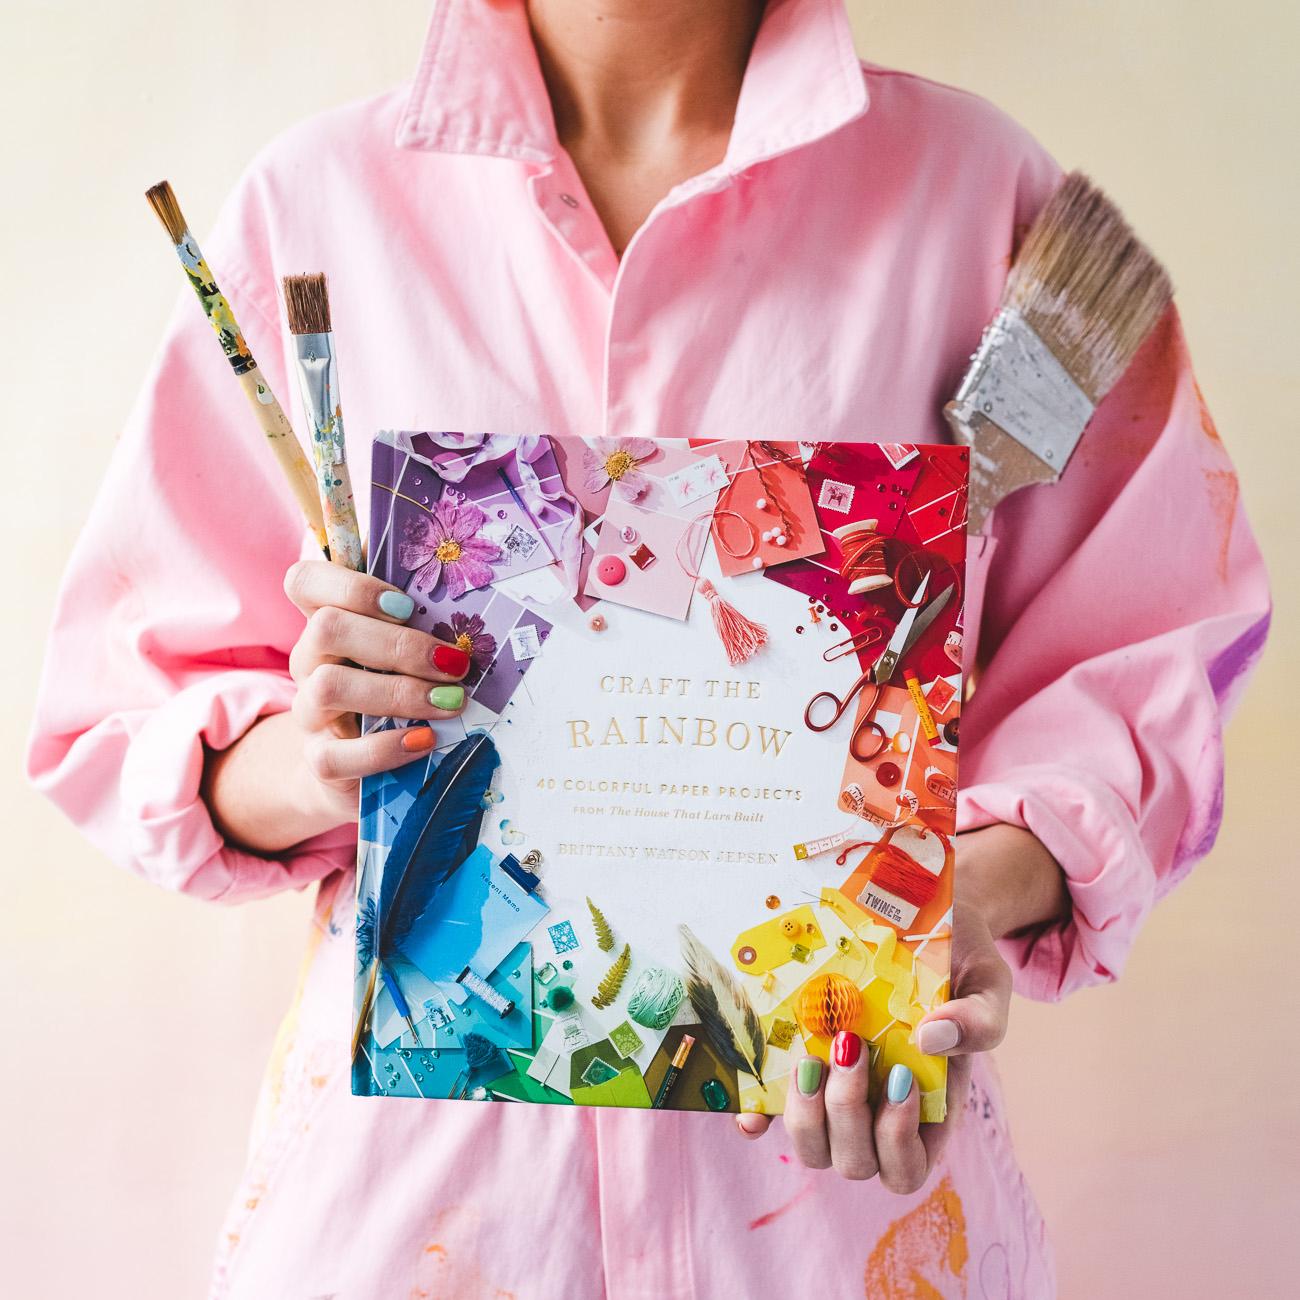 Craft the Rainbow by Brittany Jepsen